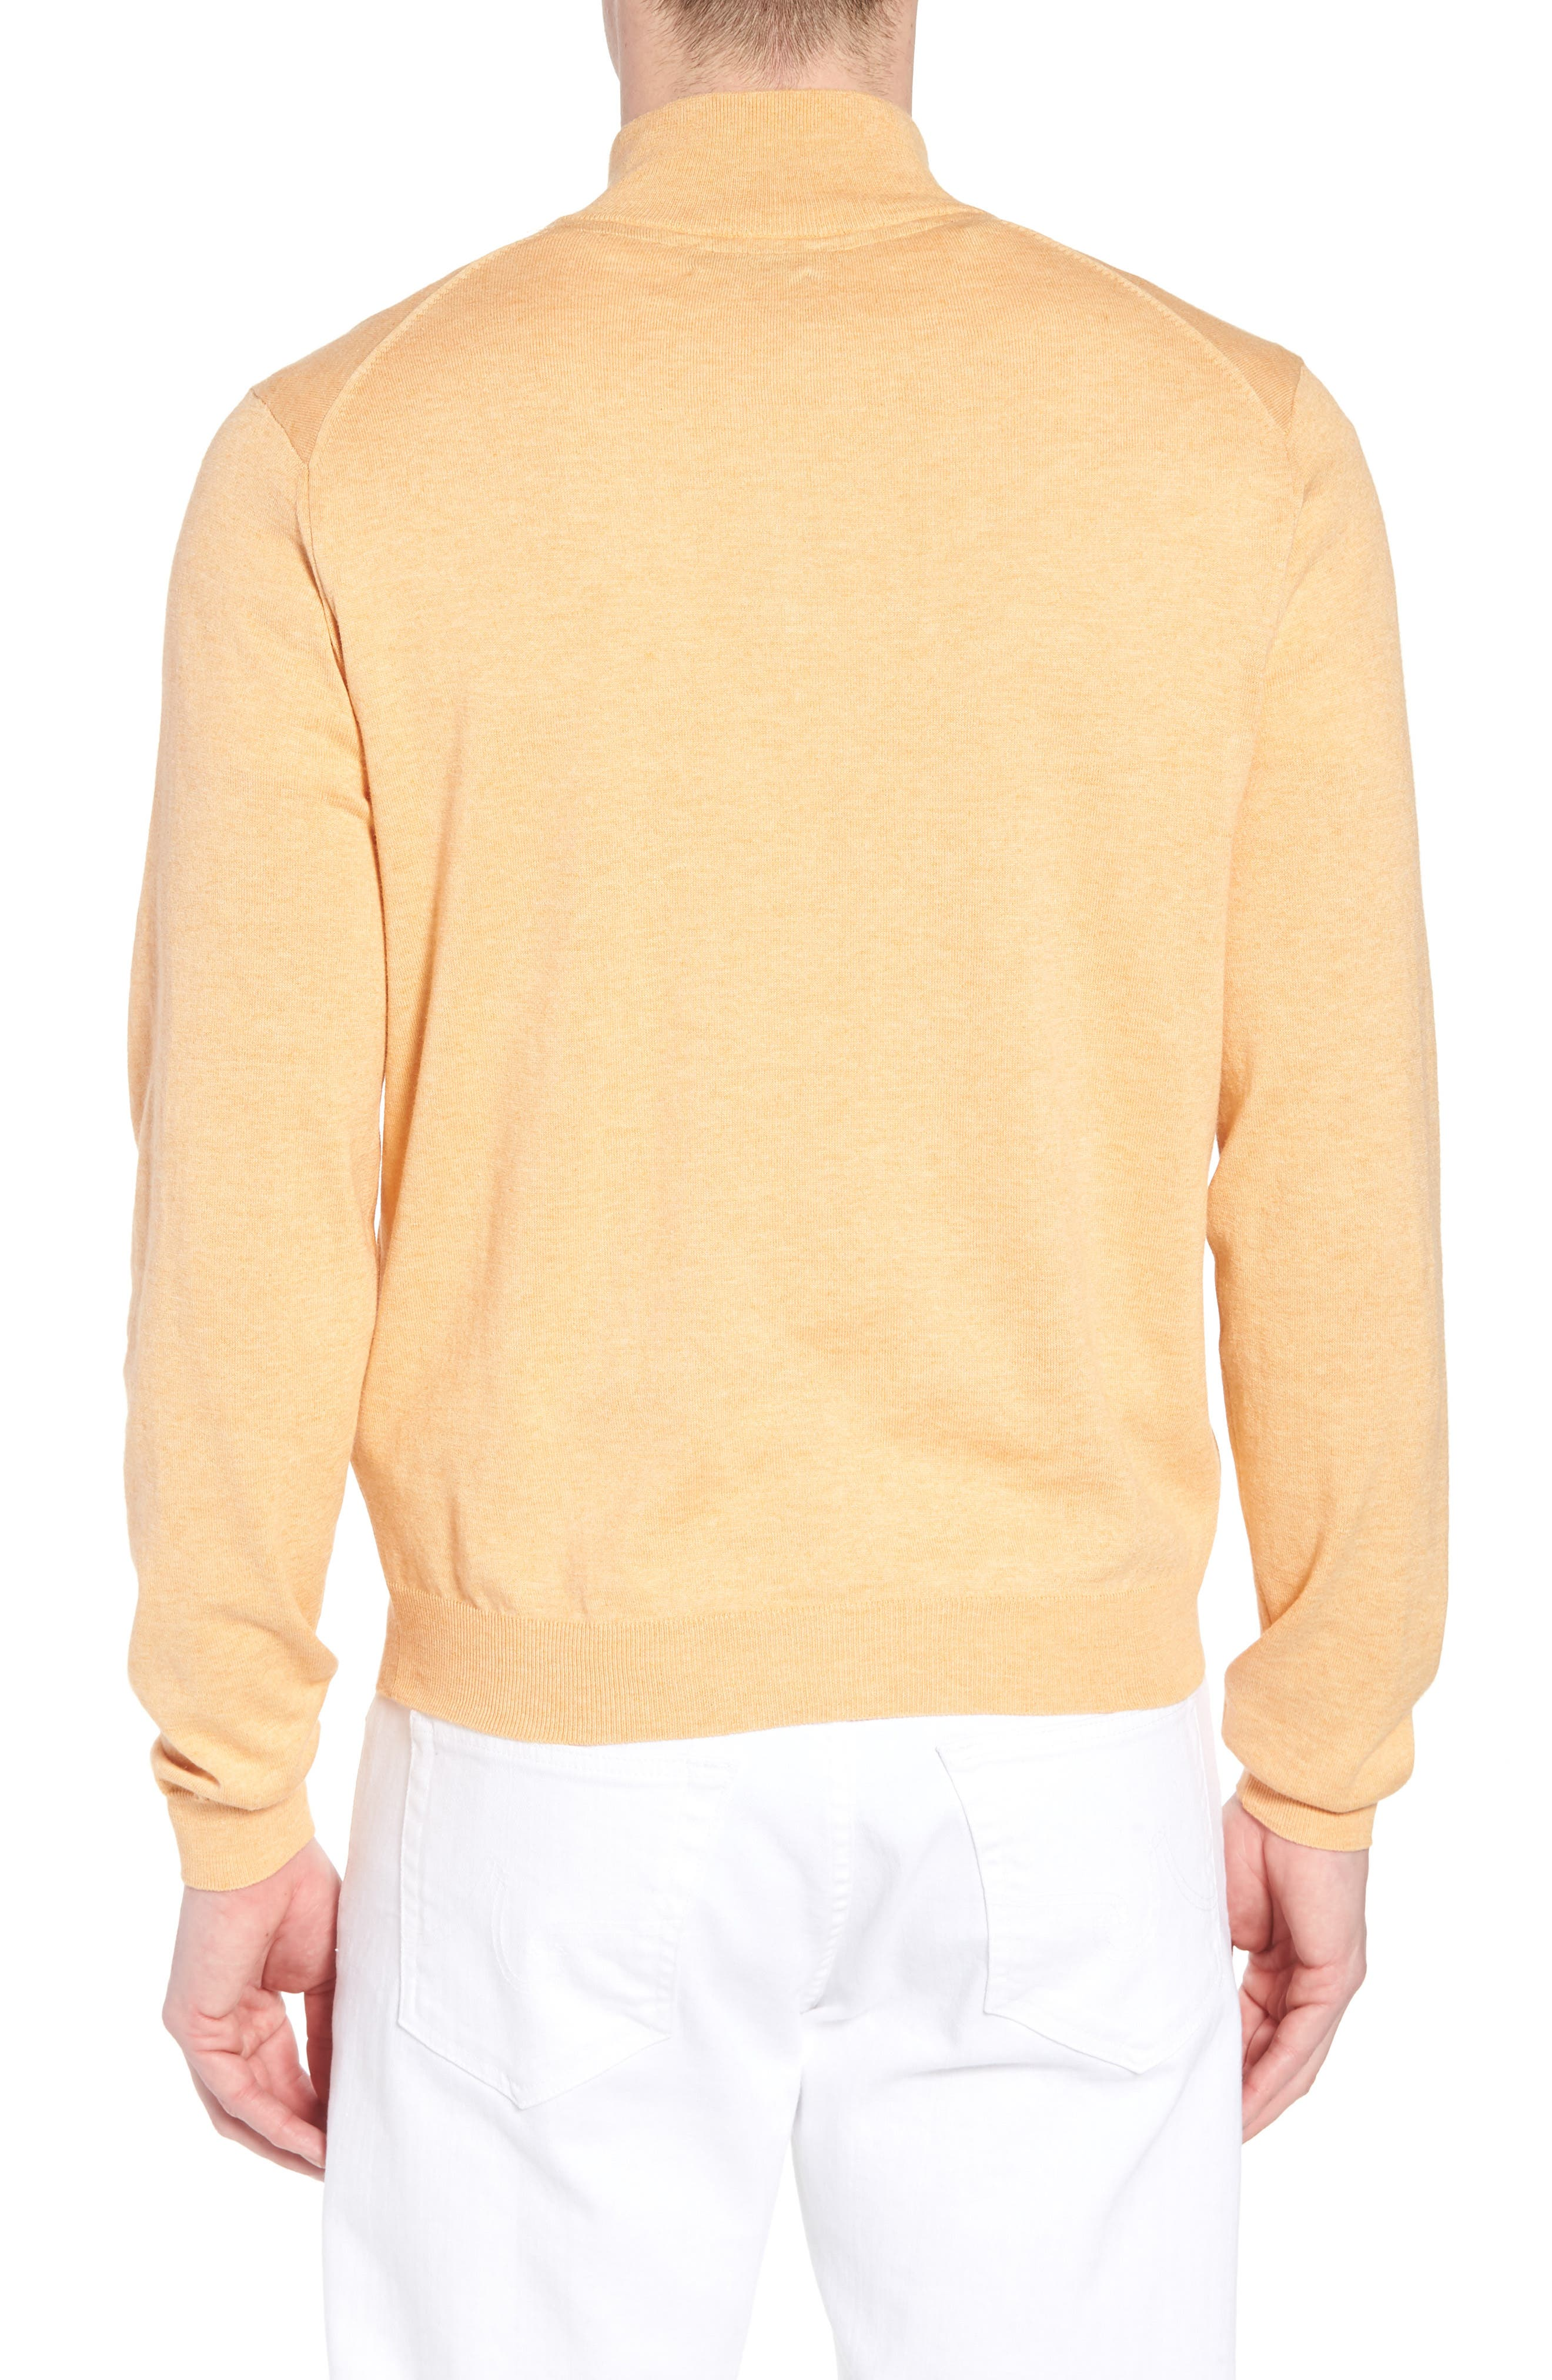 Cotton & Silk Quarter Zip Pullover,                             Alternate thumbnail 2, color,                             830